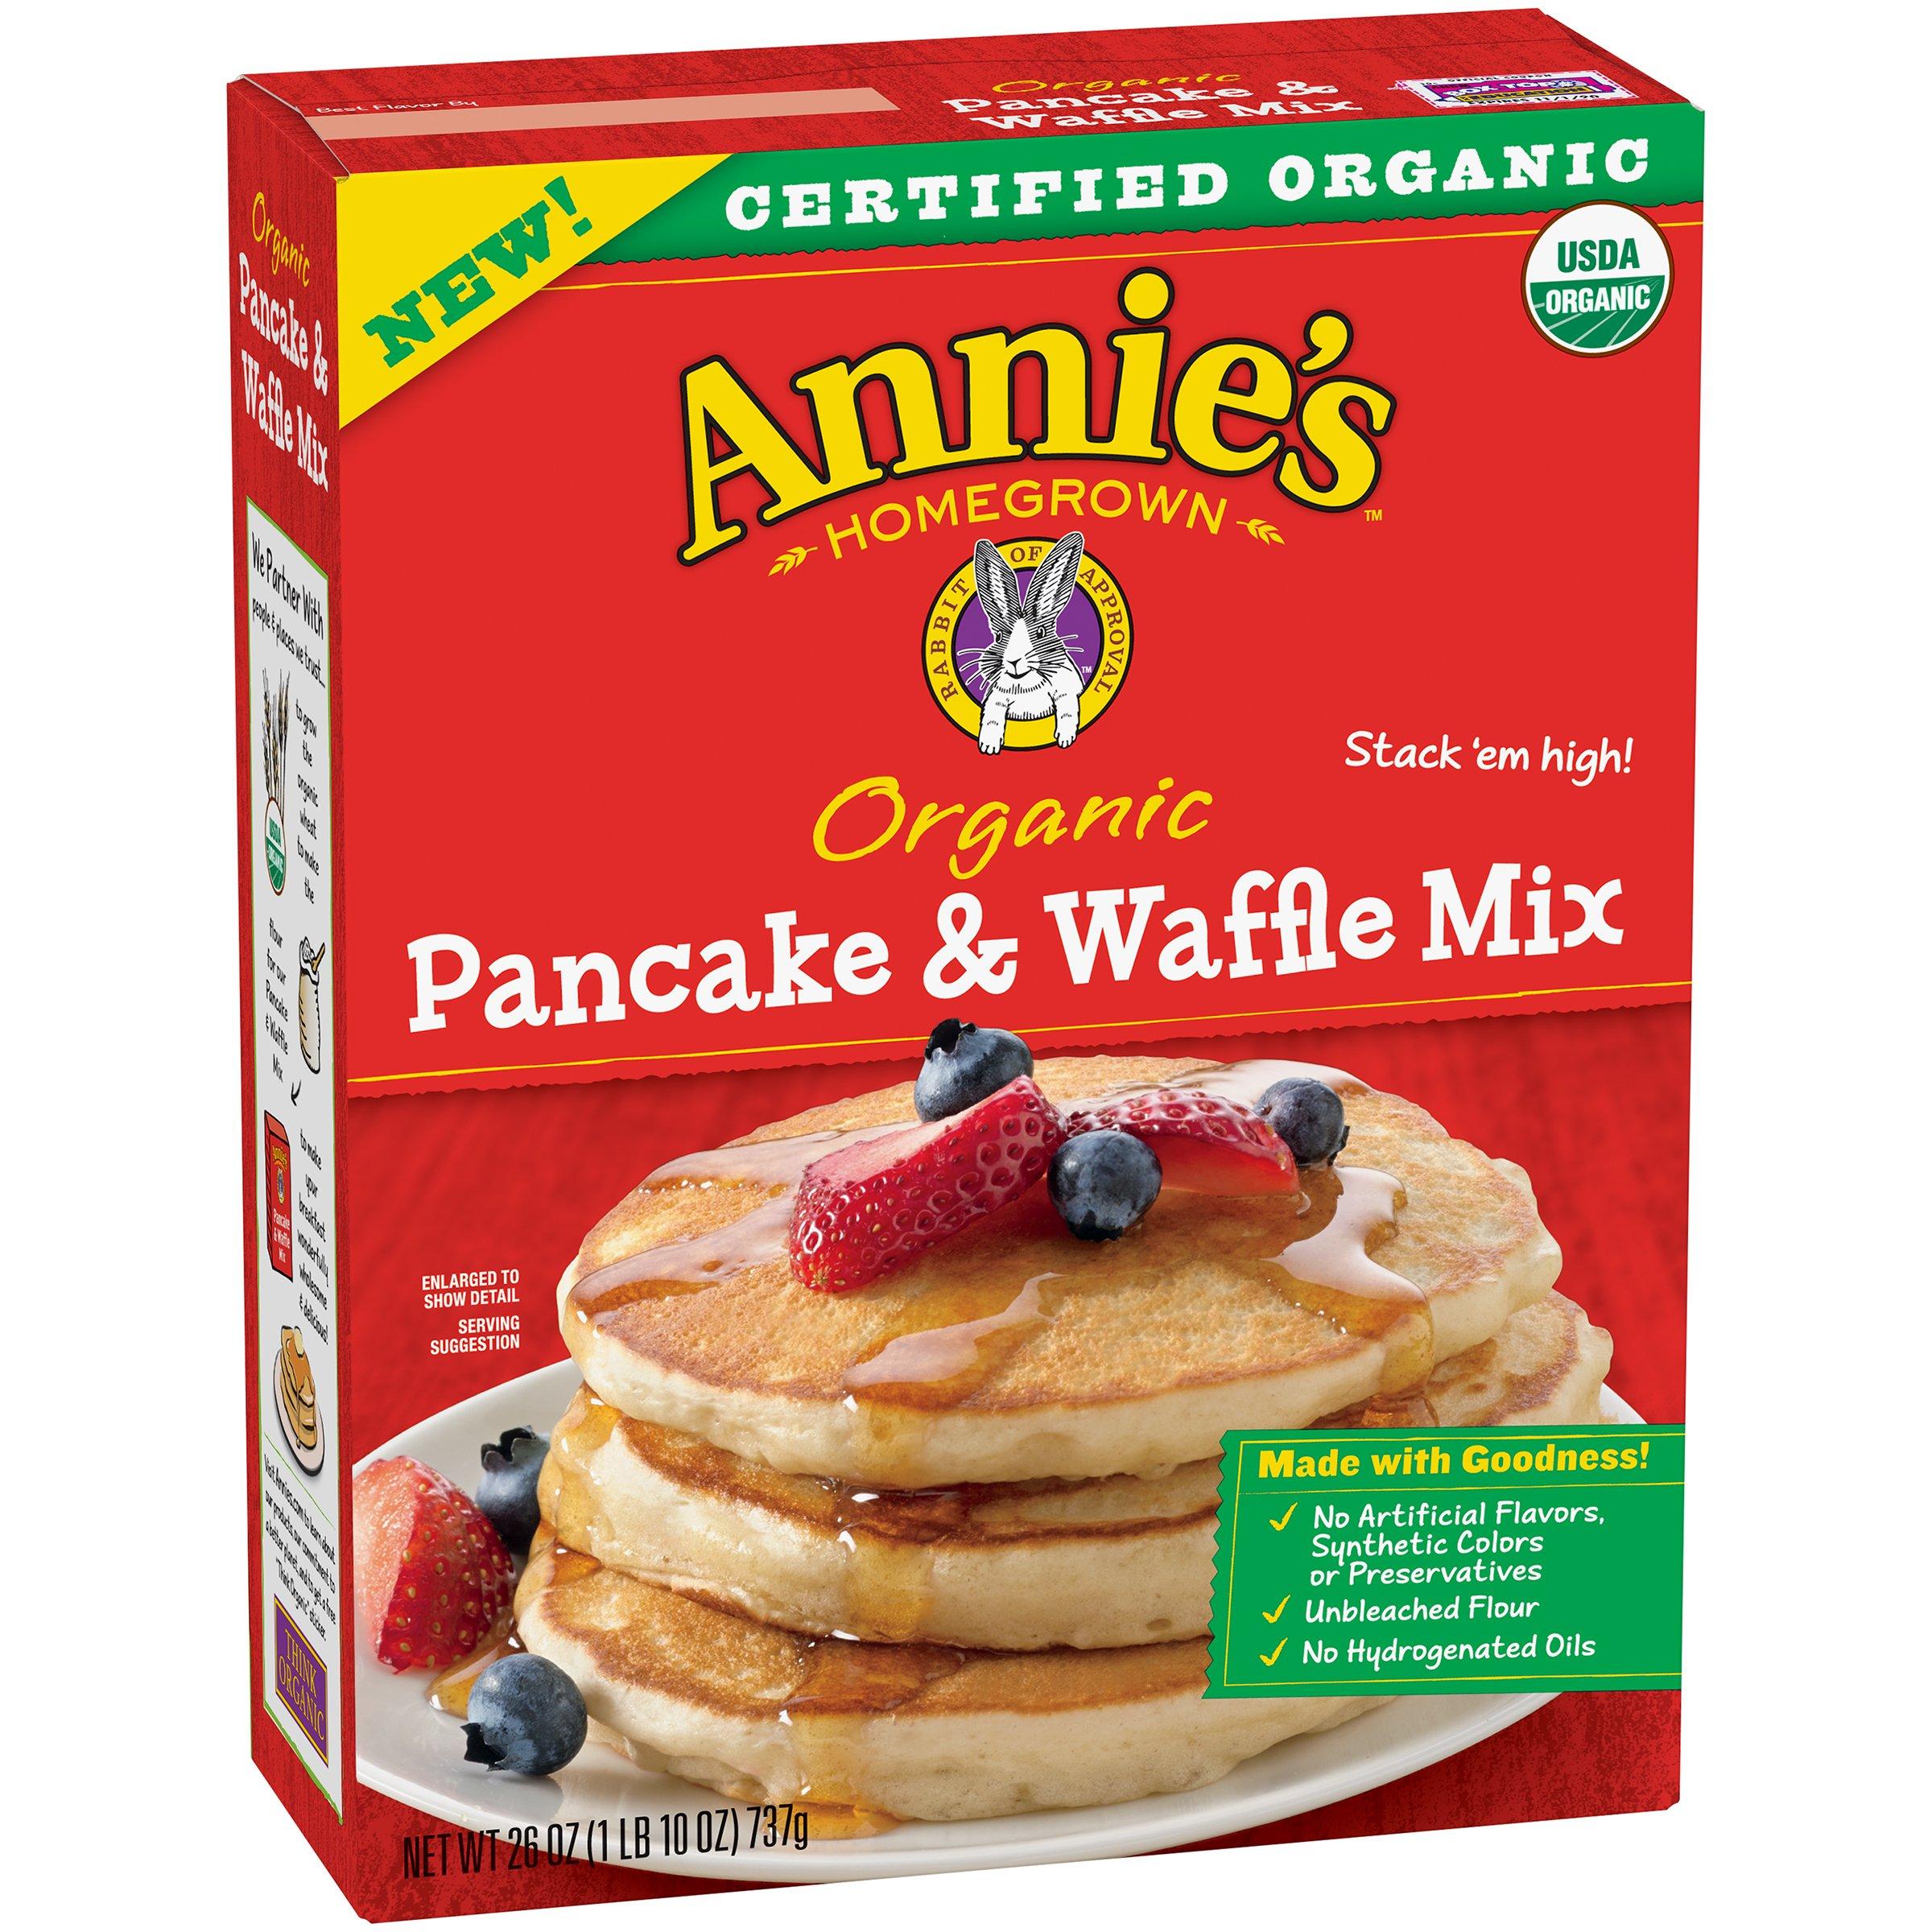 Annie's Organic Pancake & Waffle Mix, 26 oz